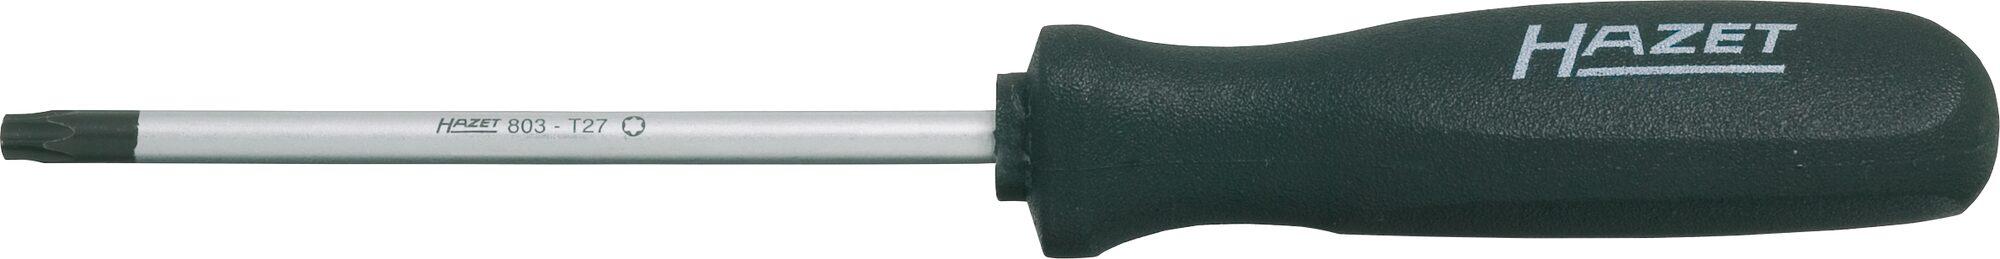 HAZET Schraubendreher trinamic 803-T40 ∙ Innen TORX® Profil ∙ T40